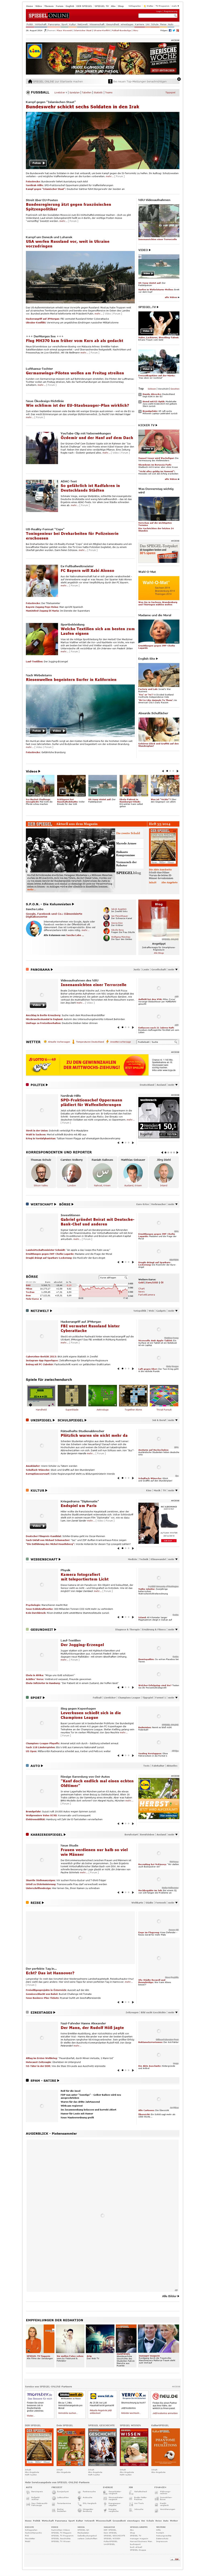 Spiegel Online at Thursday Aug. 28, 2014, 7:18 a.m. UTC